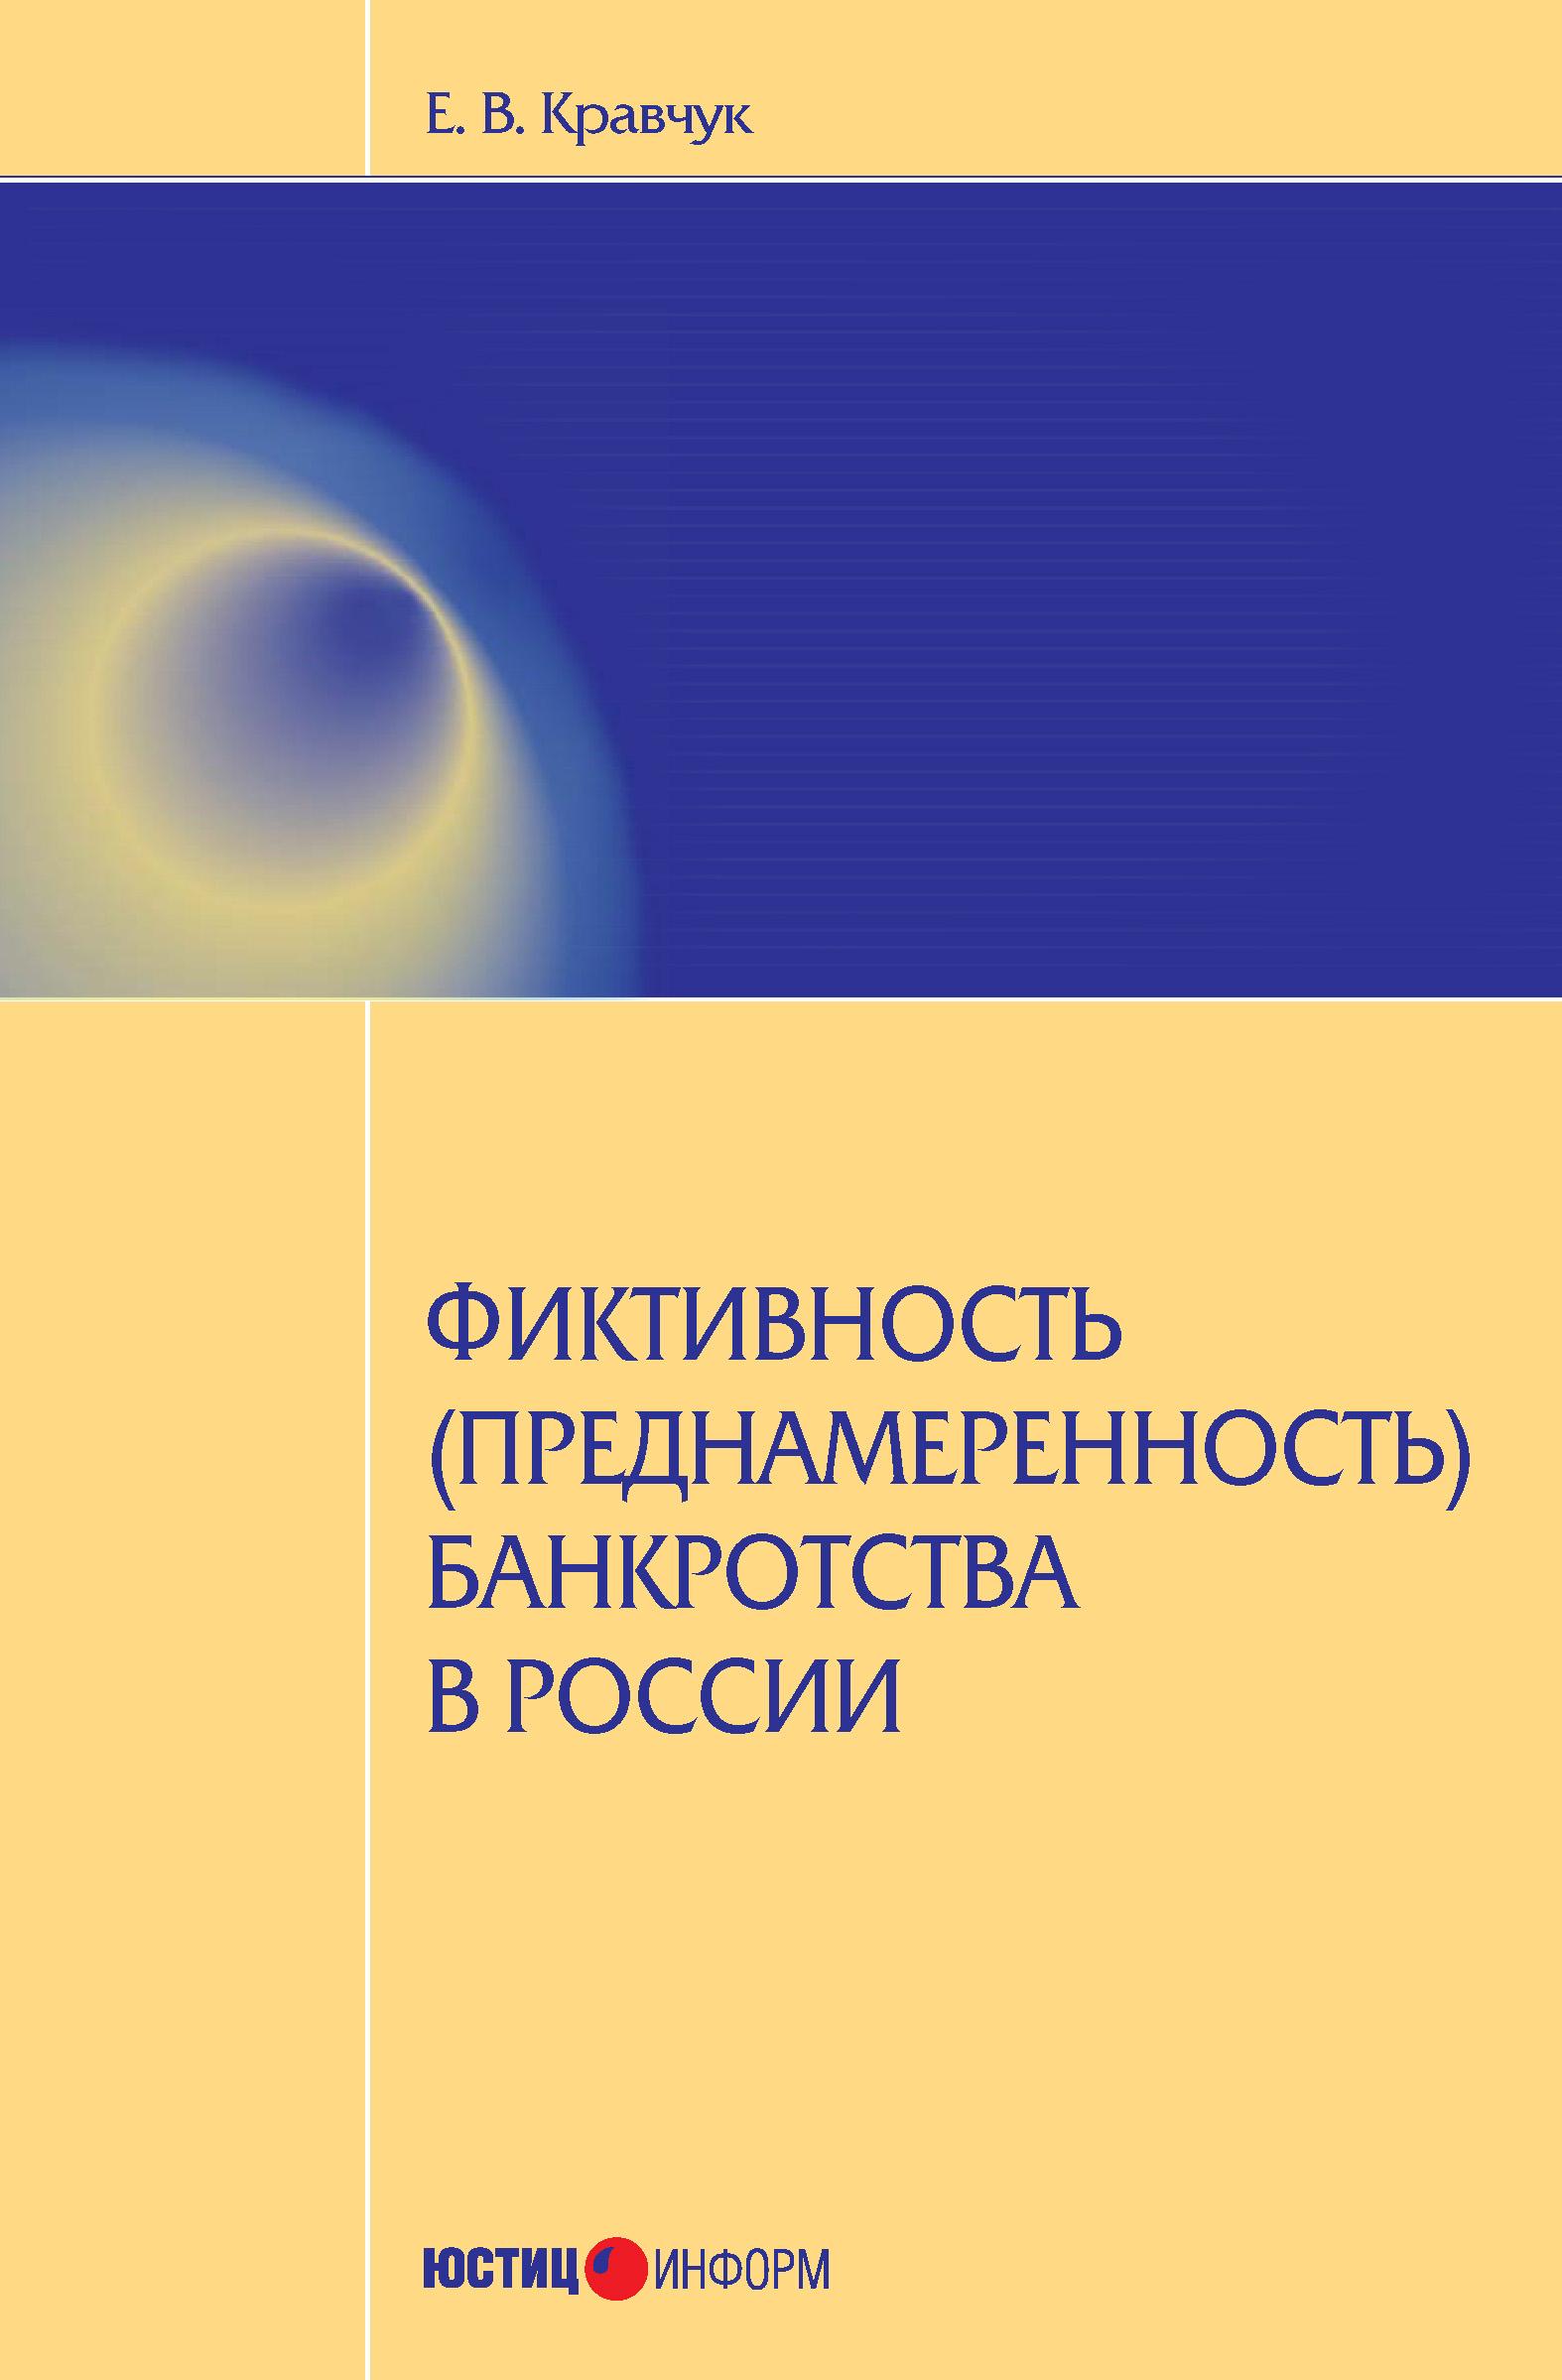 Обложка книги. Автор - Евгений Кравчук